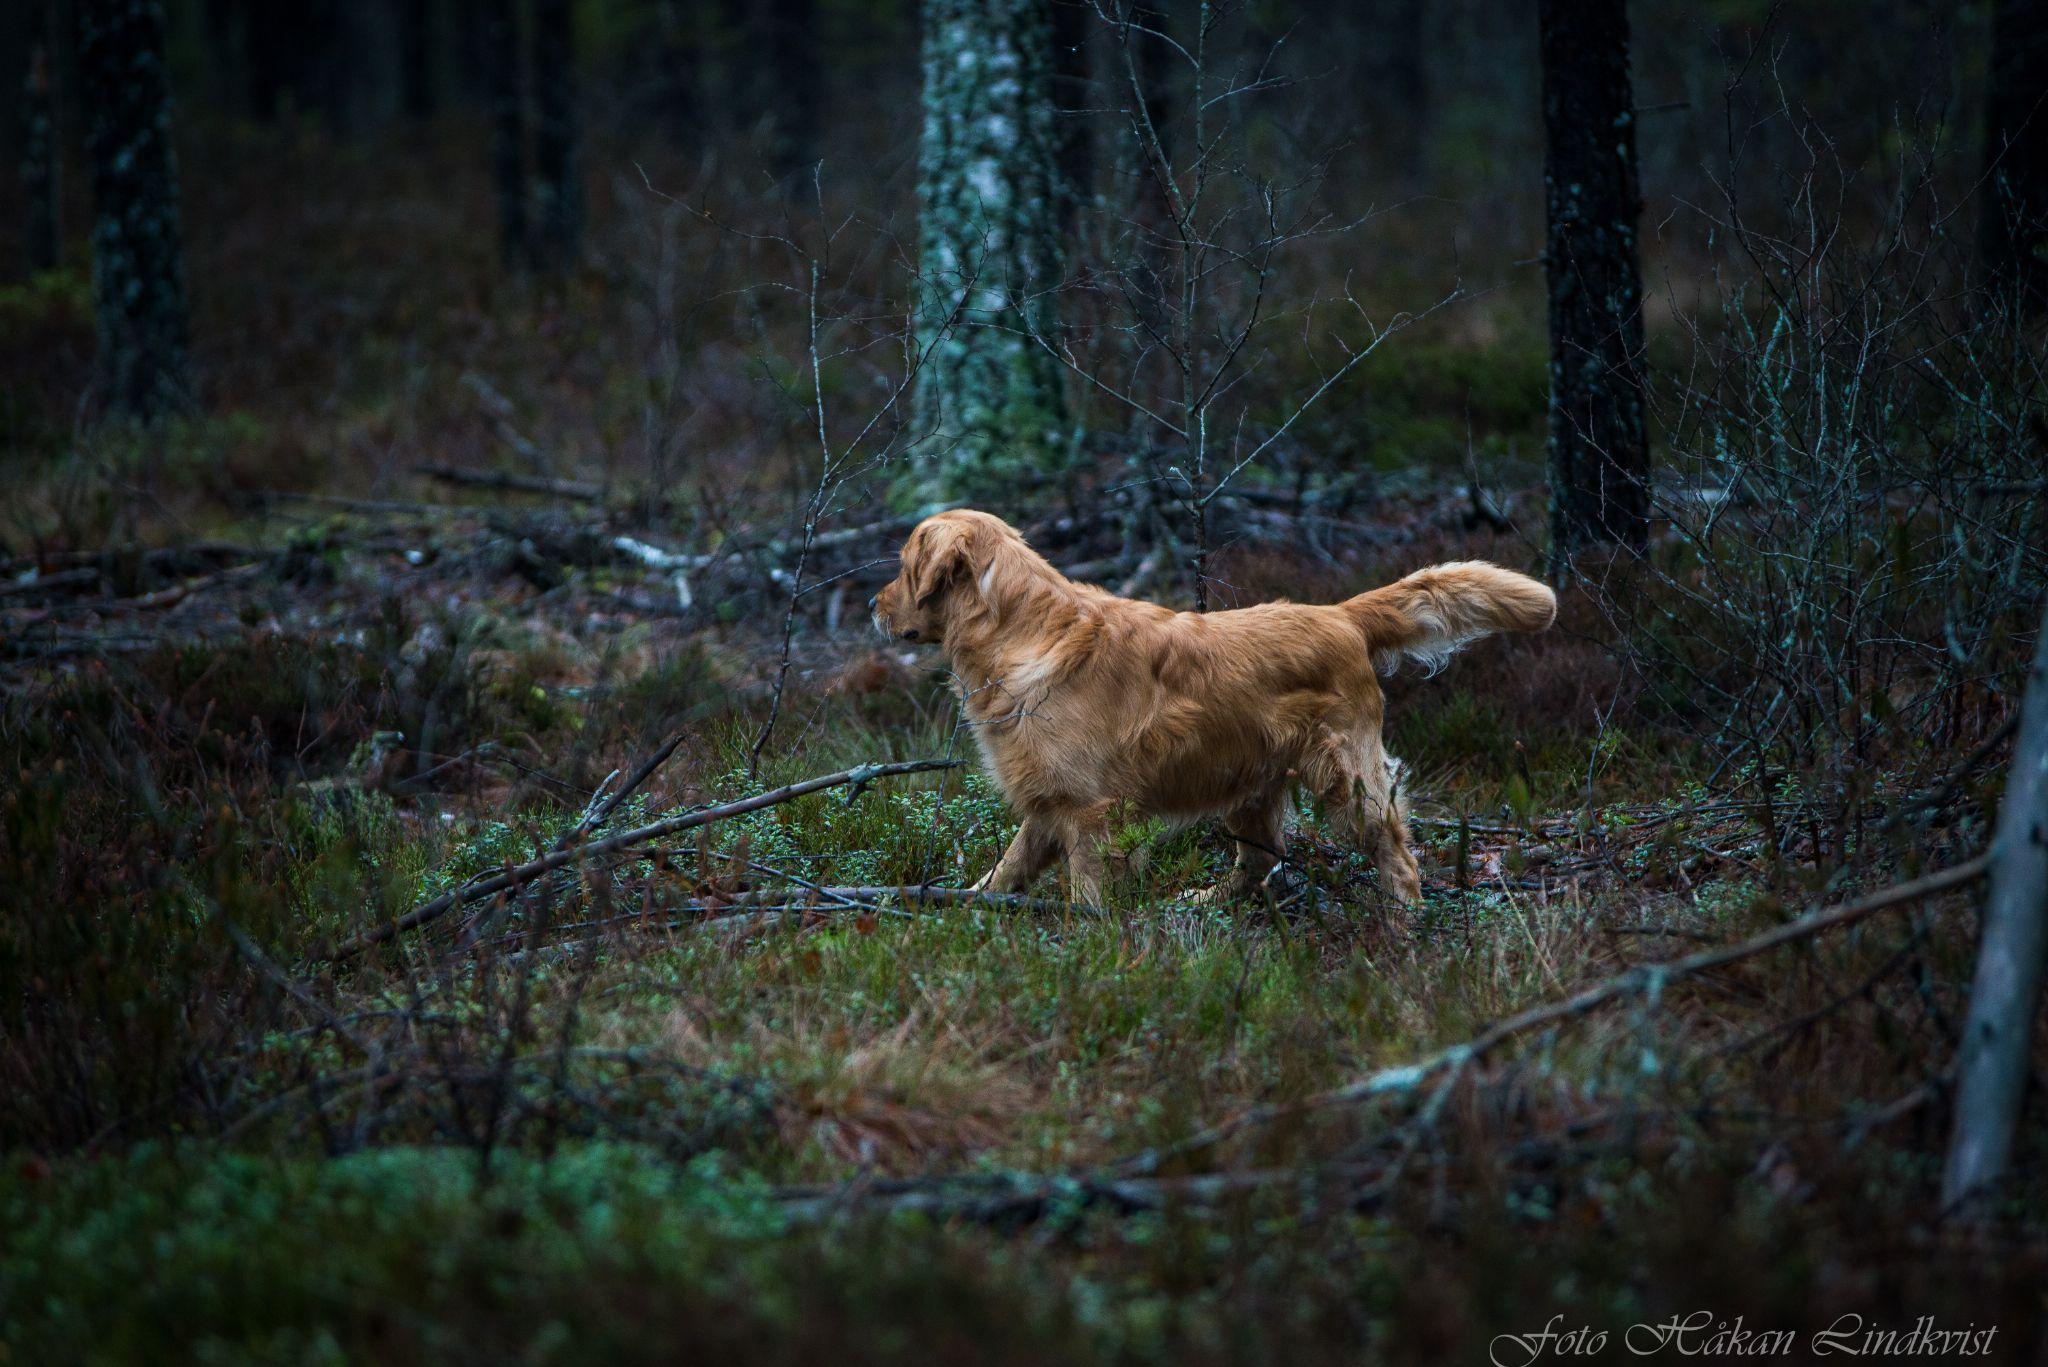 Nico by Håkan Lindkvist